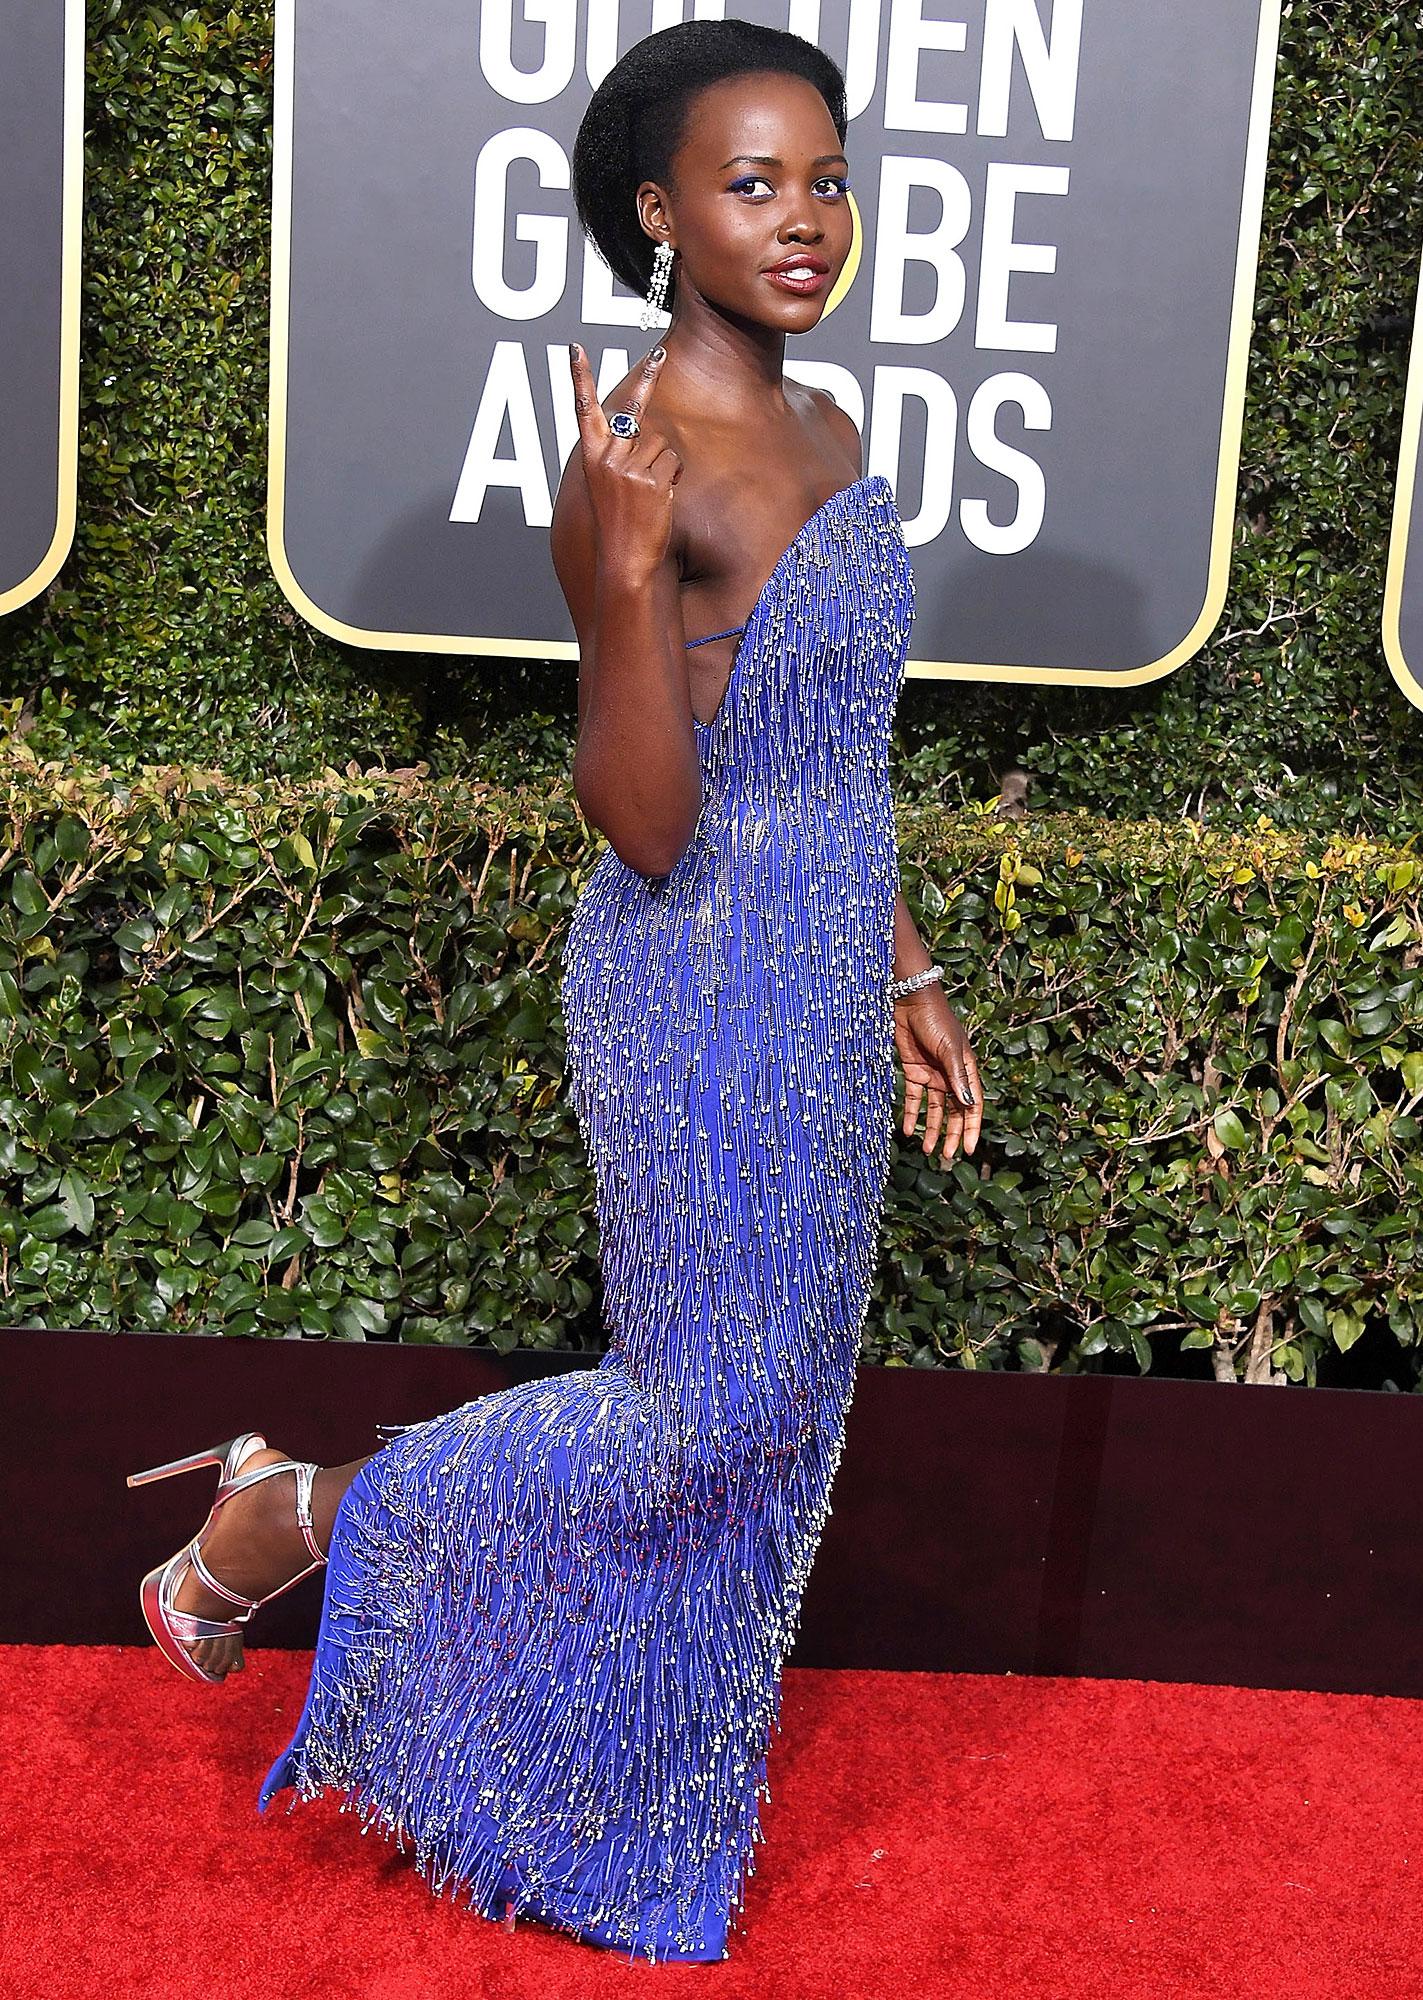 Shop Lupita Nyong Golden Globes 2019 Shoes